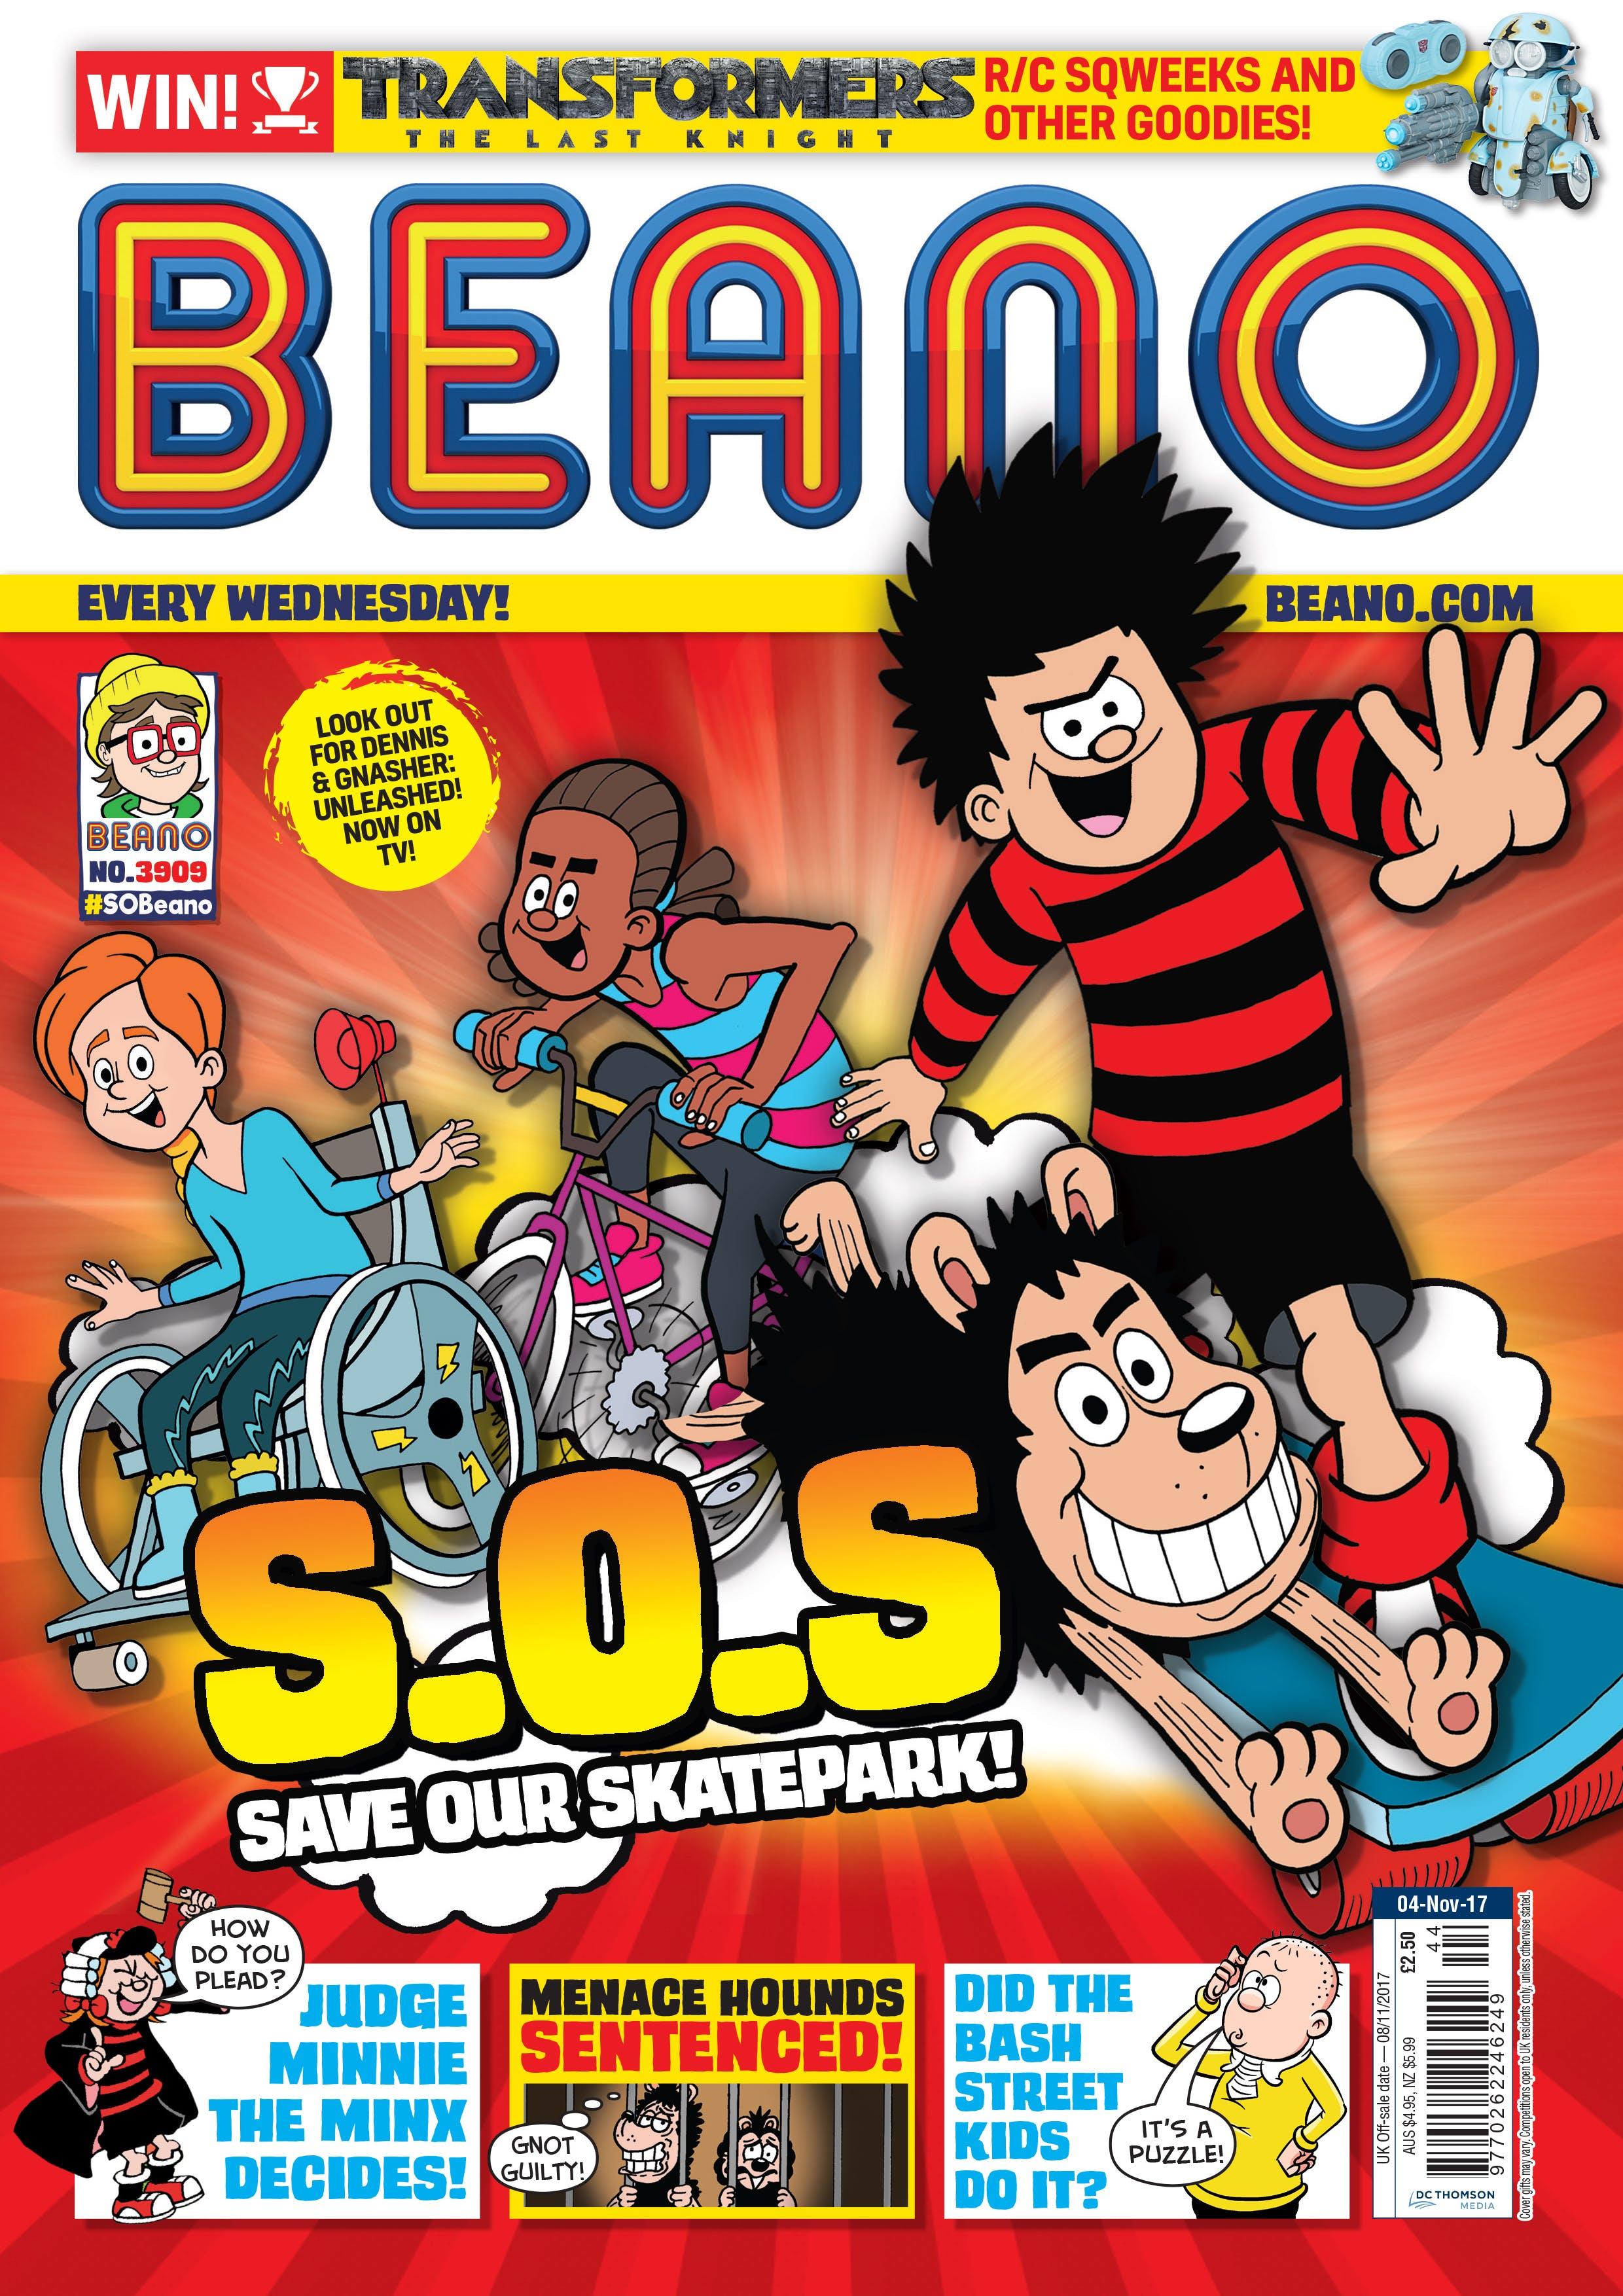 Beano Issue 3909